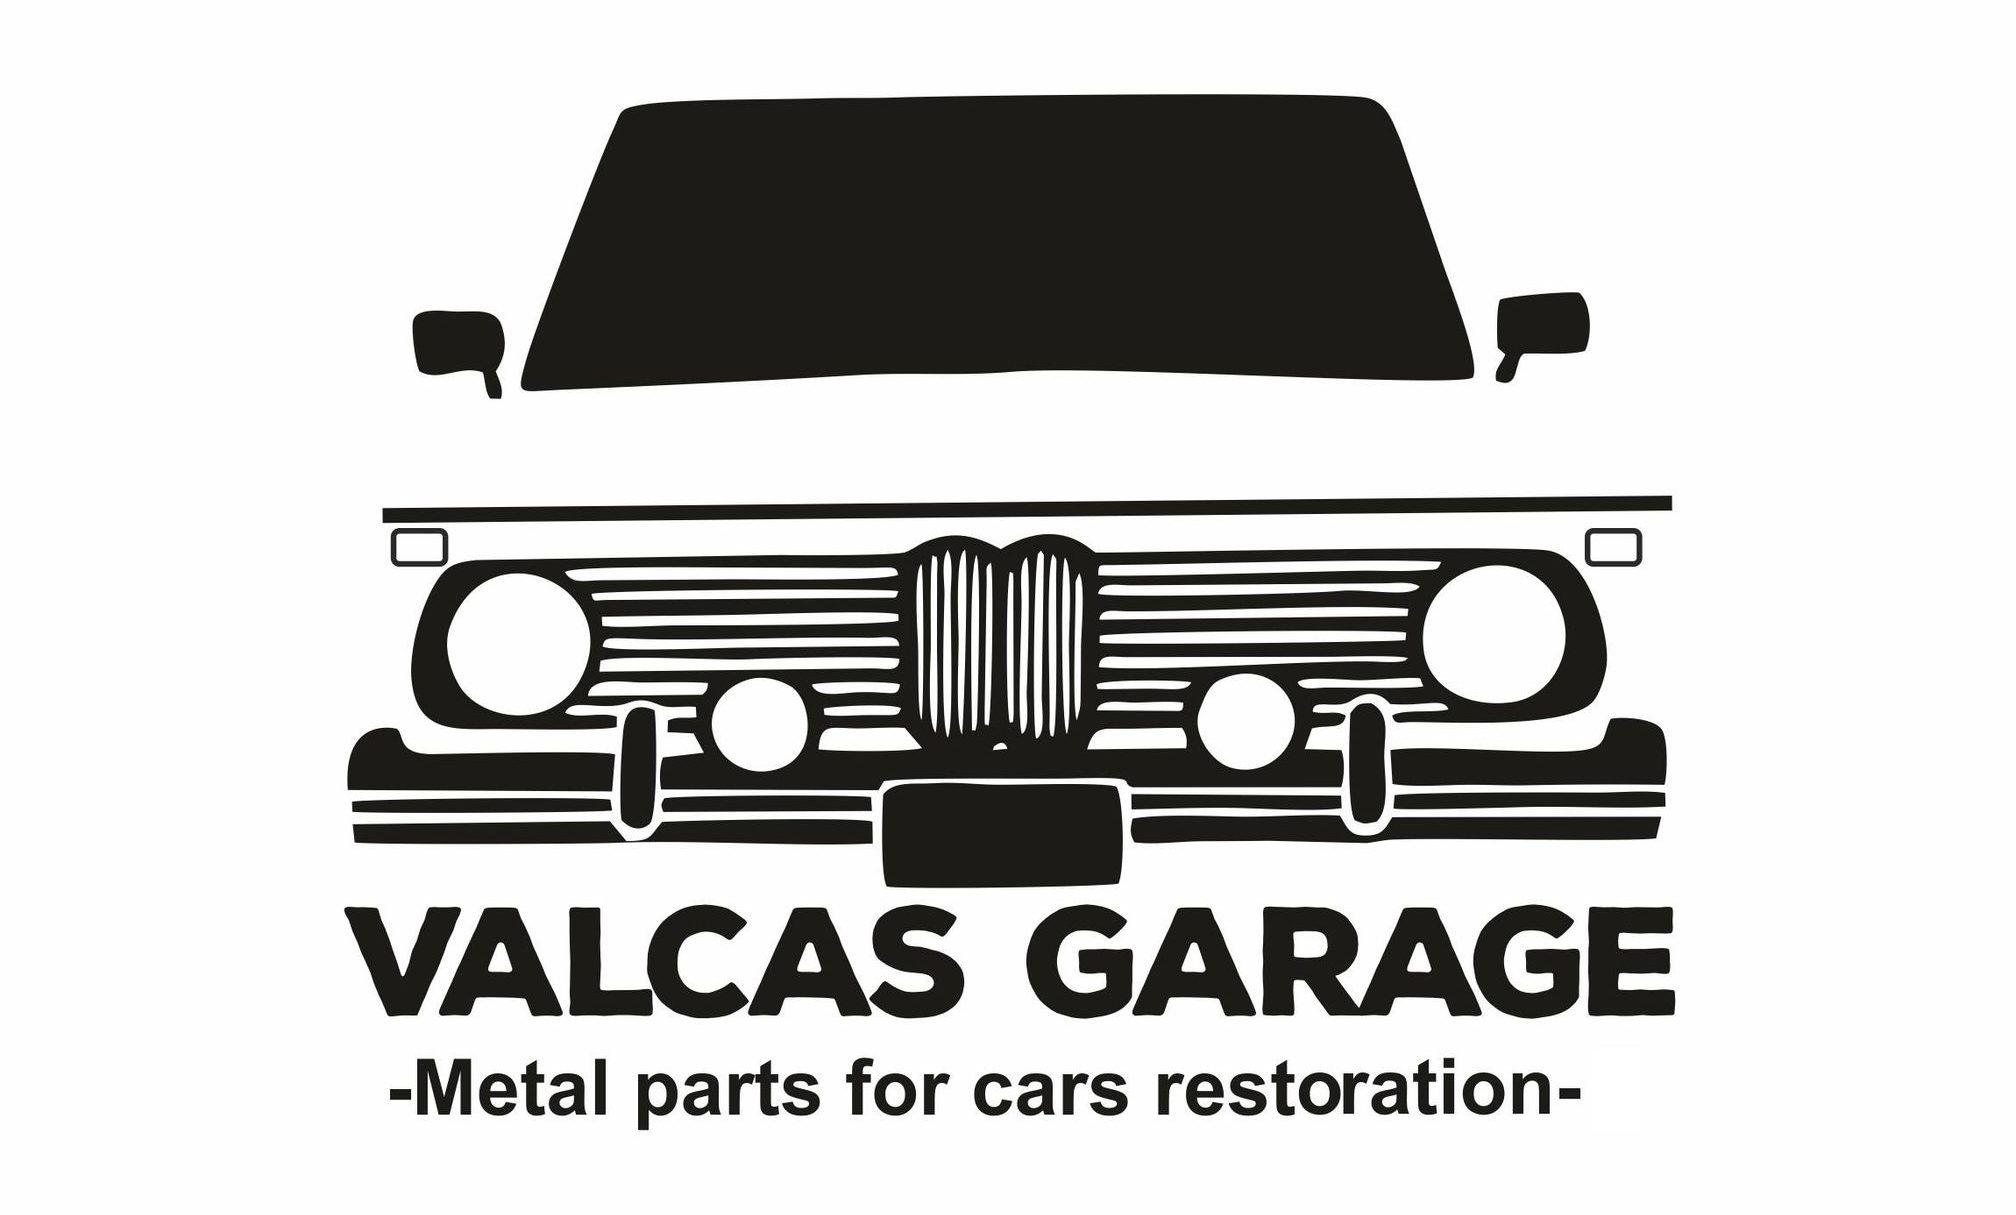 ValcasGarage